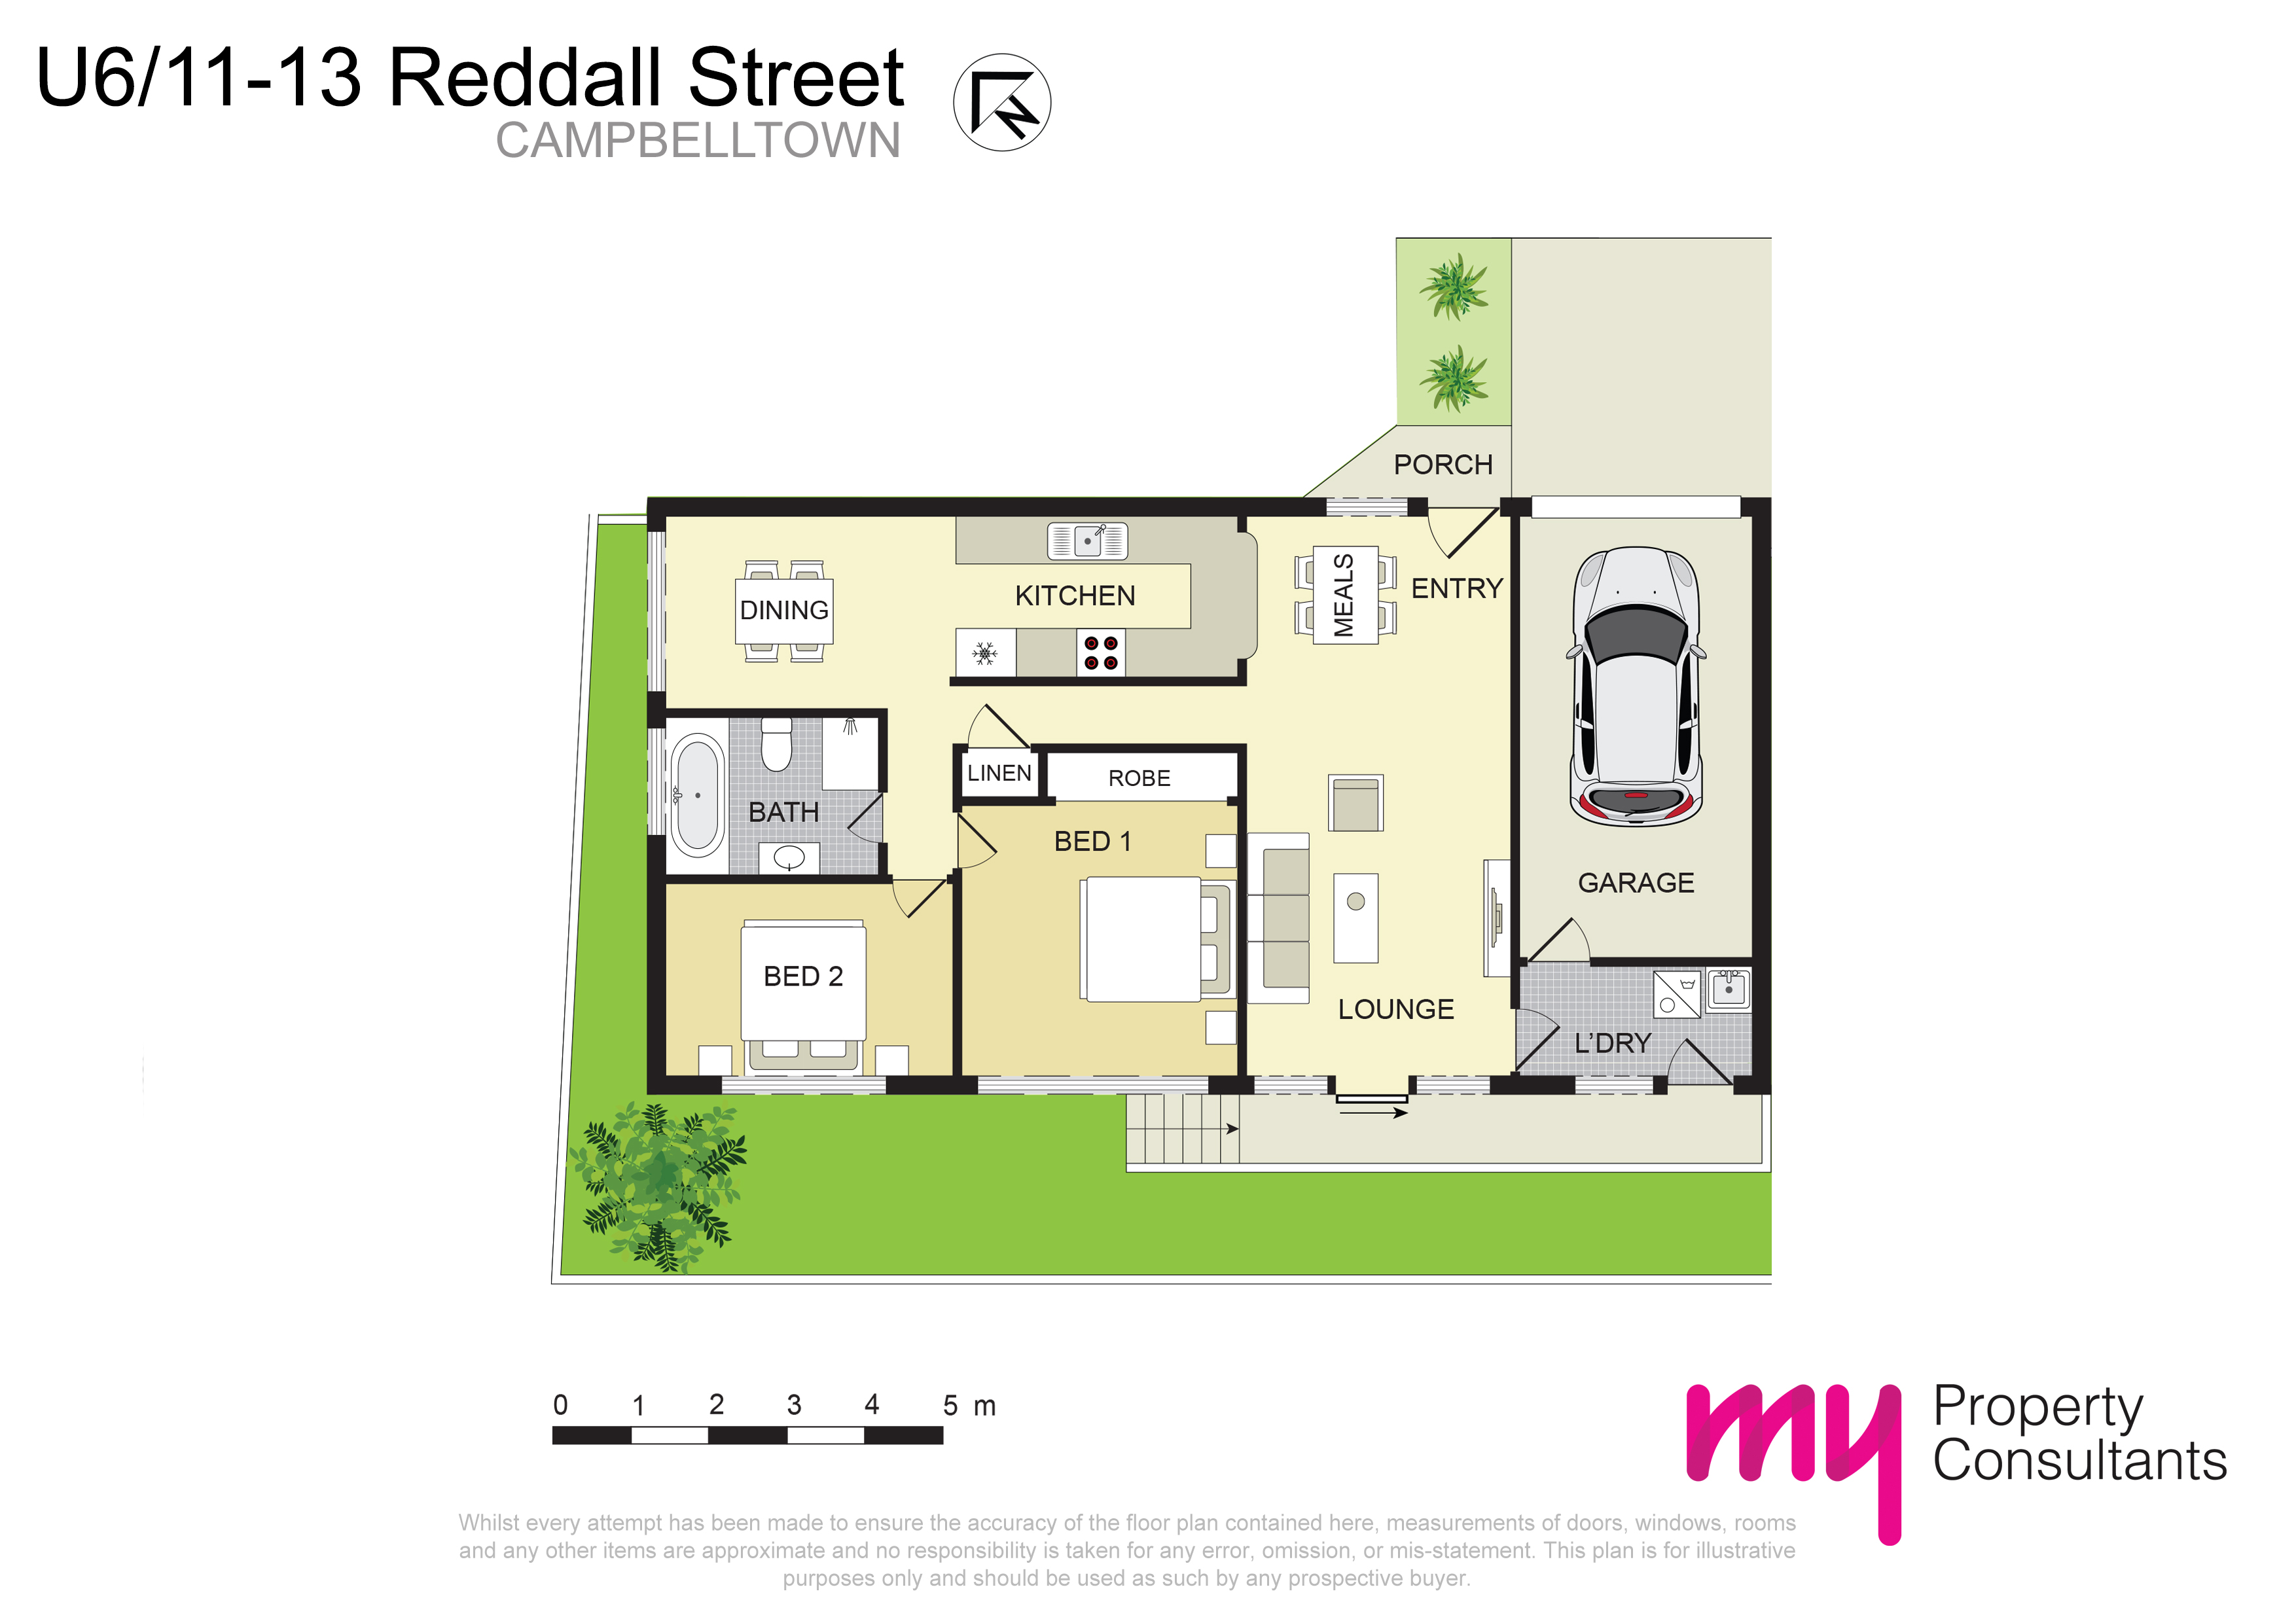 6/11-13 Reddall Street, CAMPBELLTOWN